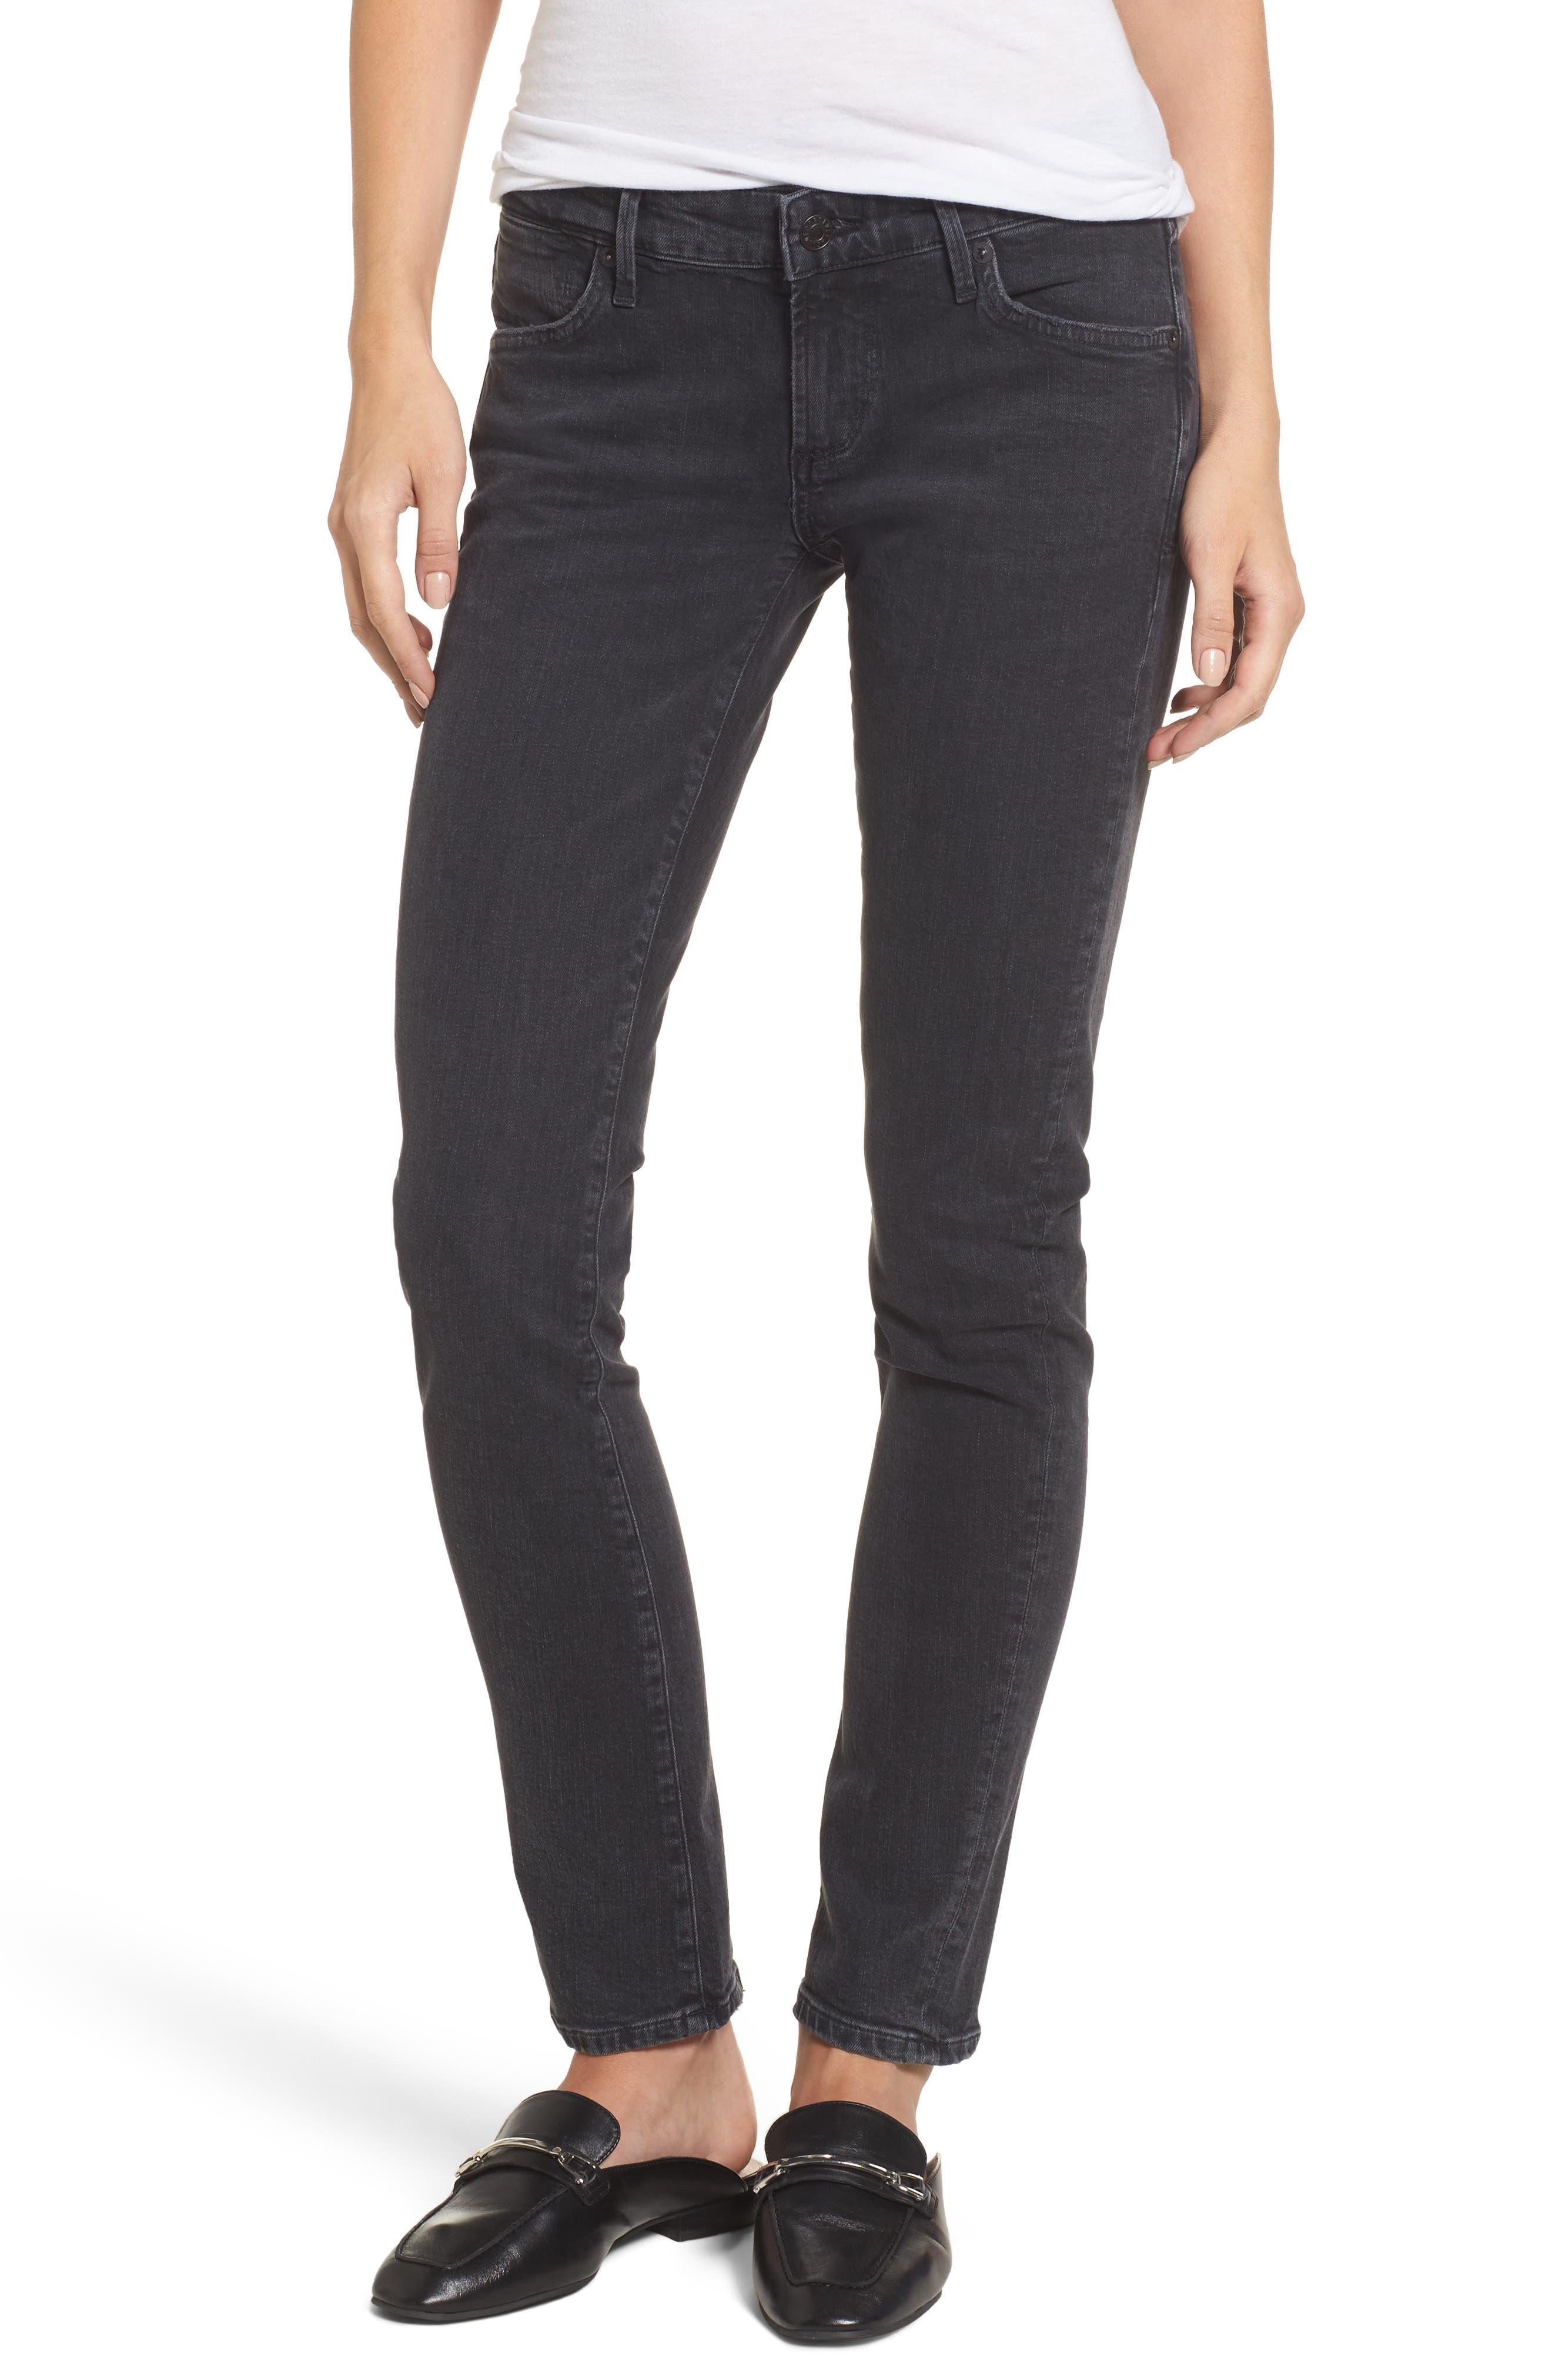 Chloe Low Rise Slim Jeans,                             Main thumbnail 1, color,                             072